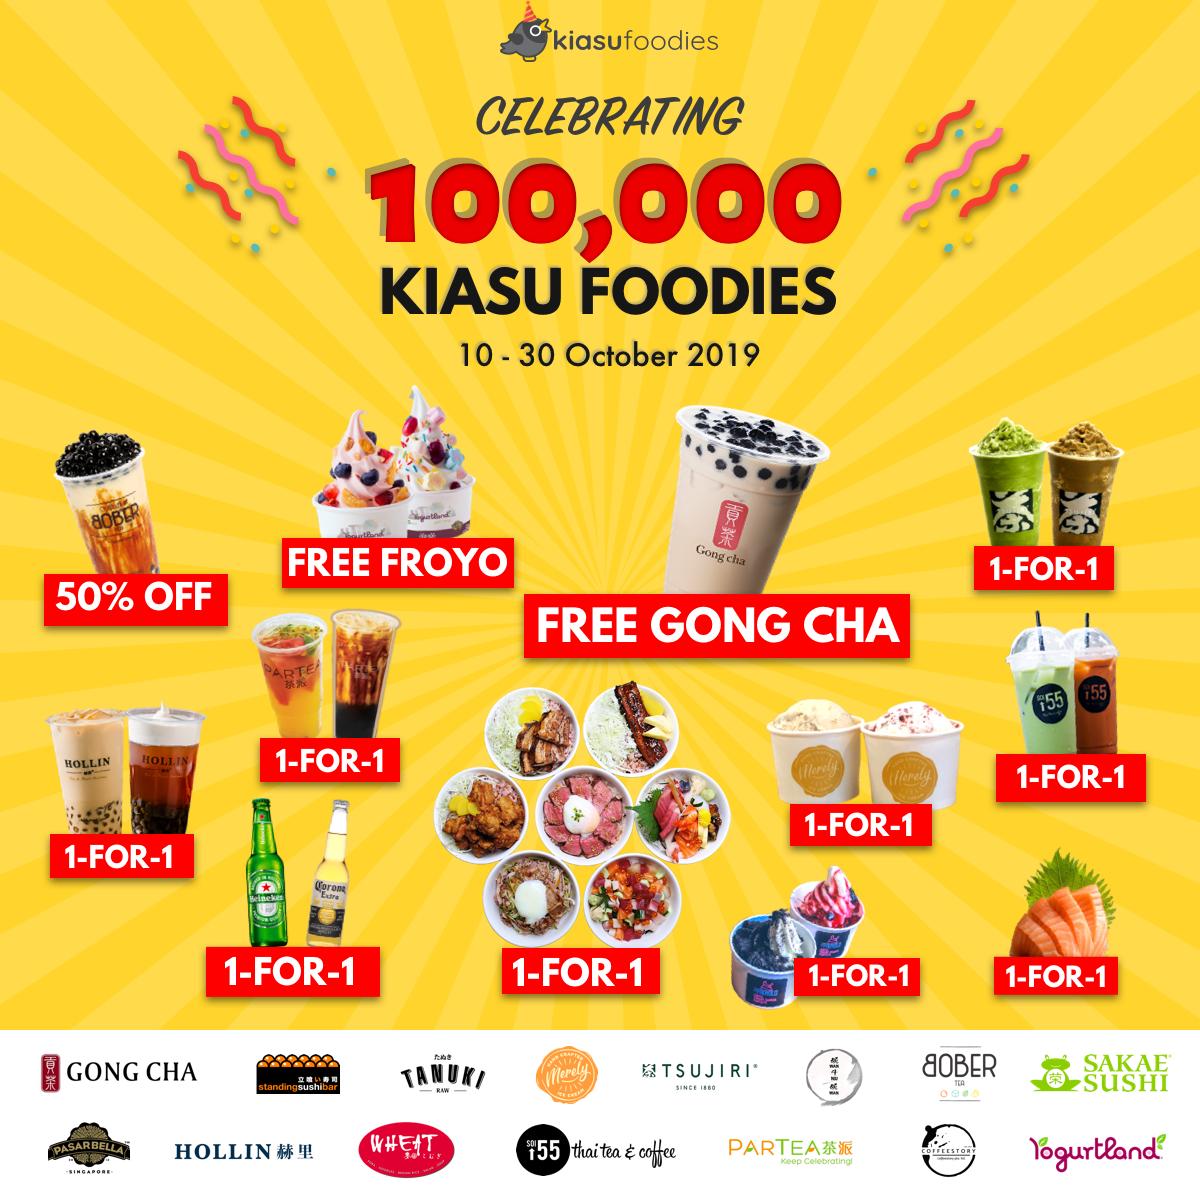 Kiasu Foodies celebrates 100K subscribers with FREE Gong Cha